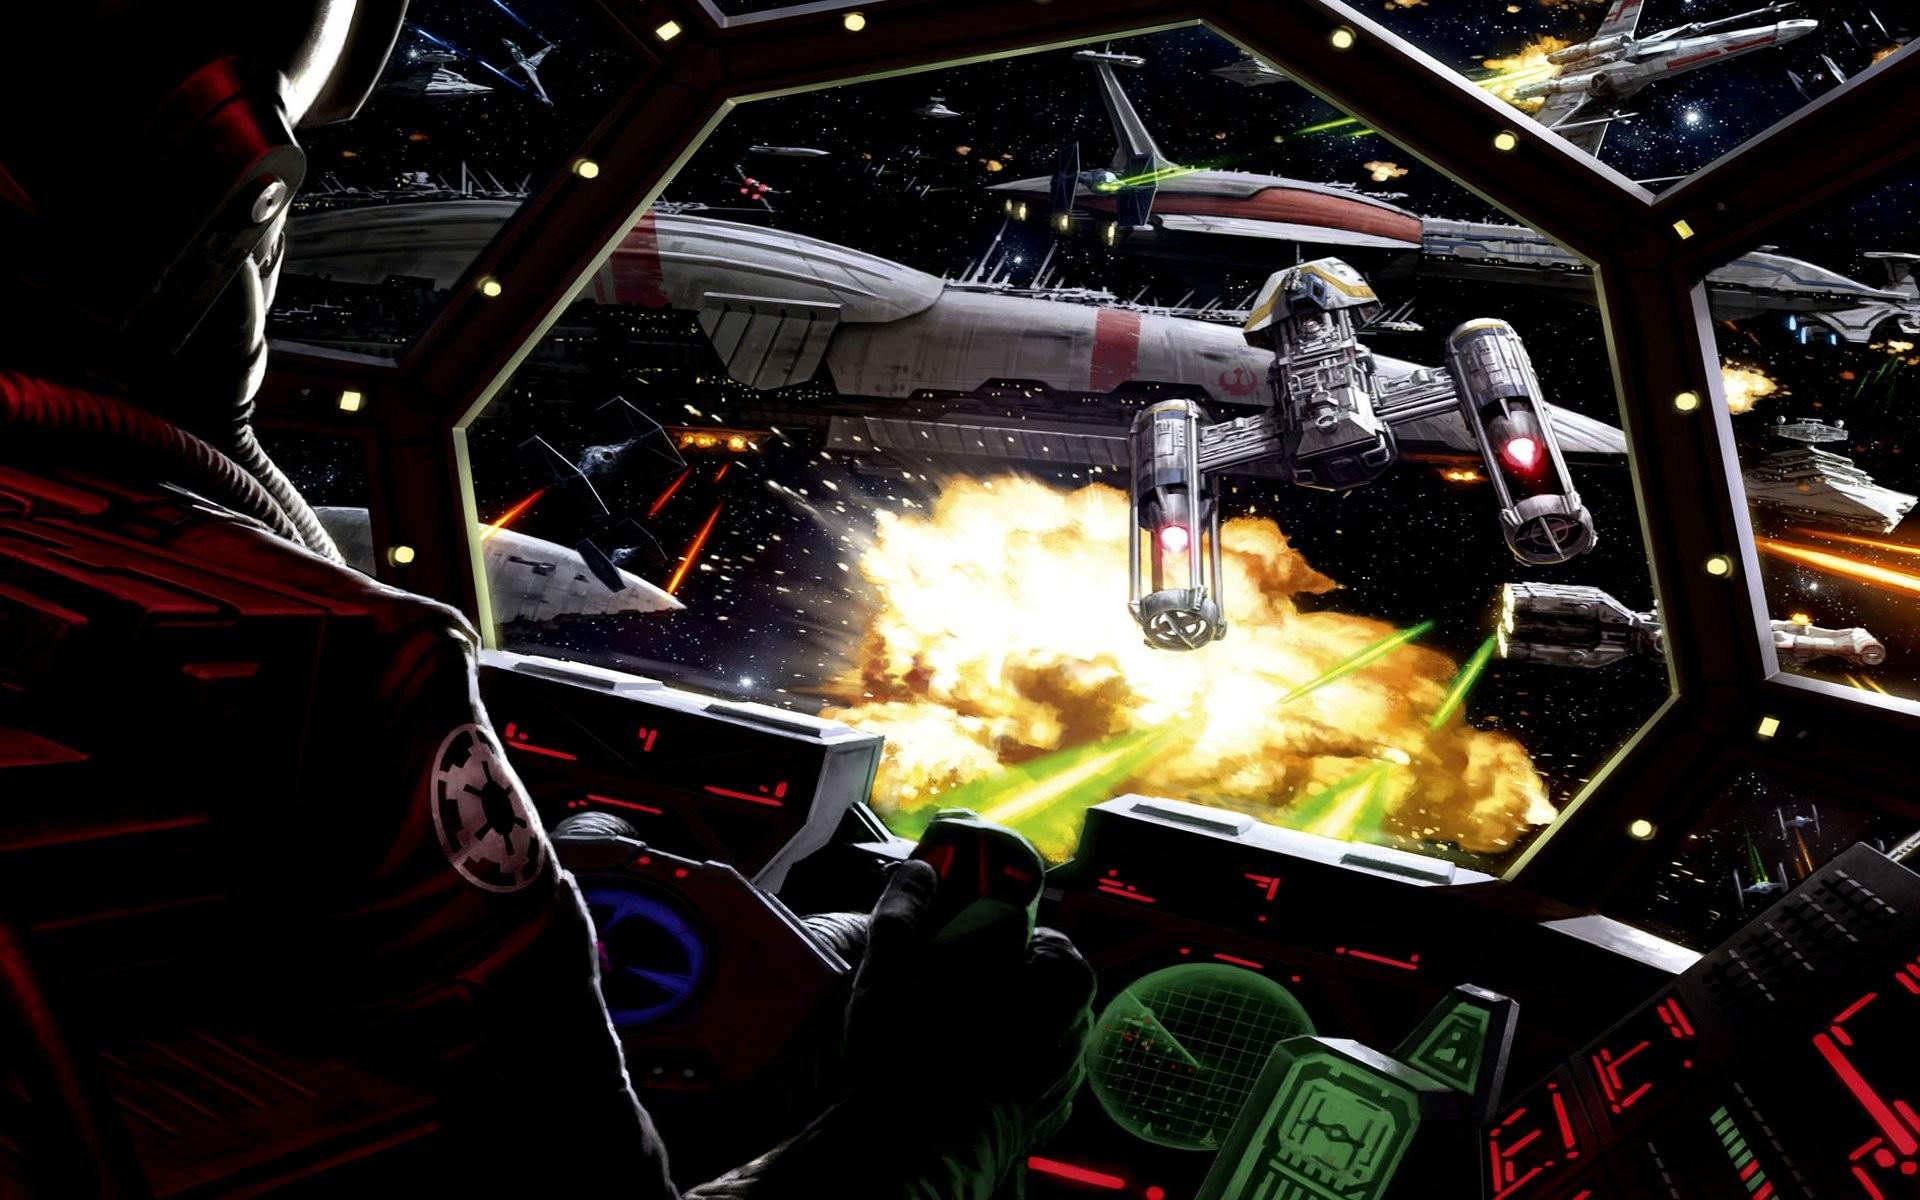 TIE FIGHTER star wars futuristic spaceship space sci-fi wallpaper      811259   WallpaperUP